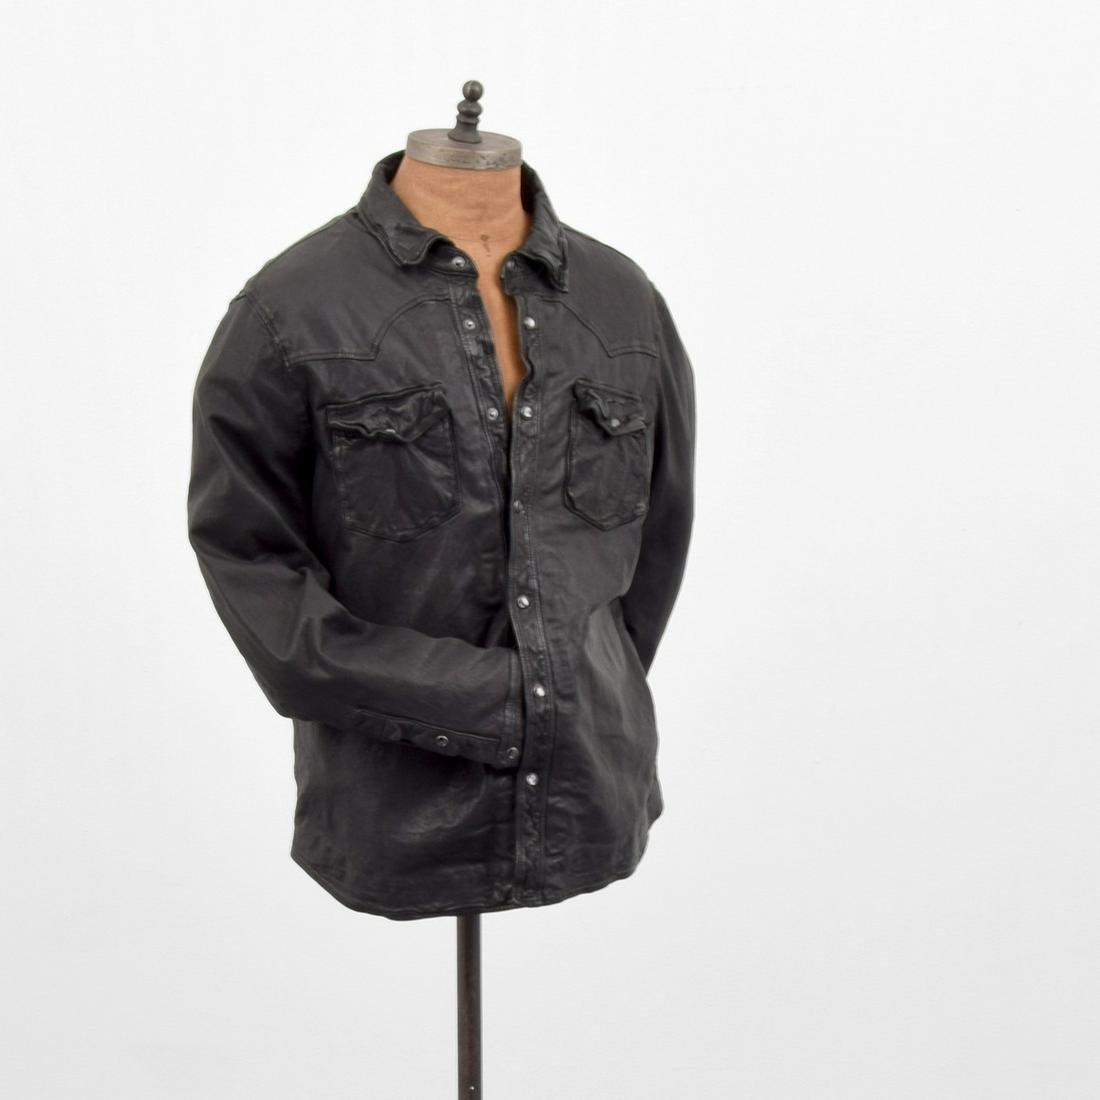 Ralph Lauren Polo Leather Button-Up Shirt Jacket, Men